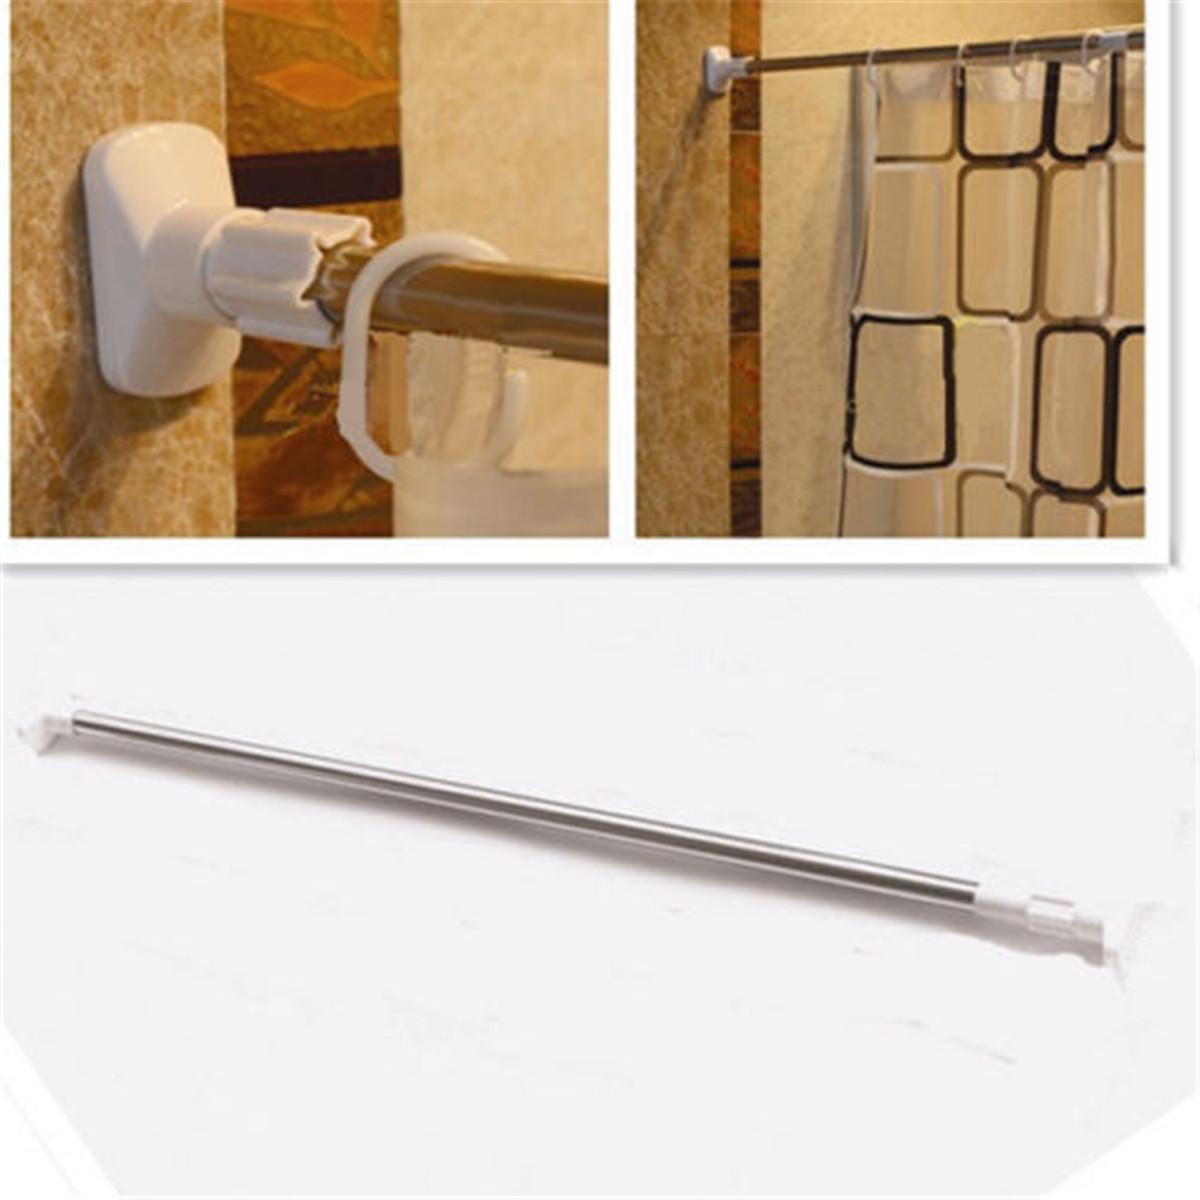 stainless steel adjustable tension door bathroom shower curtain